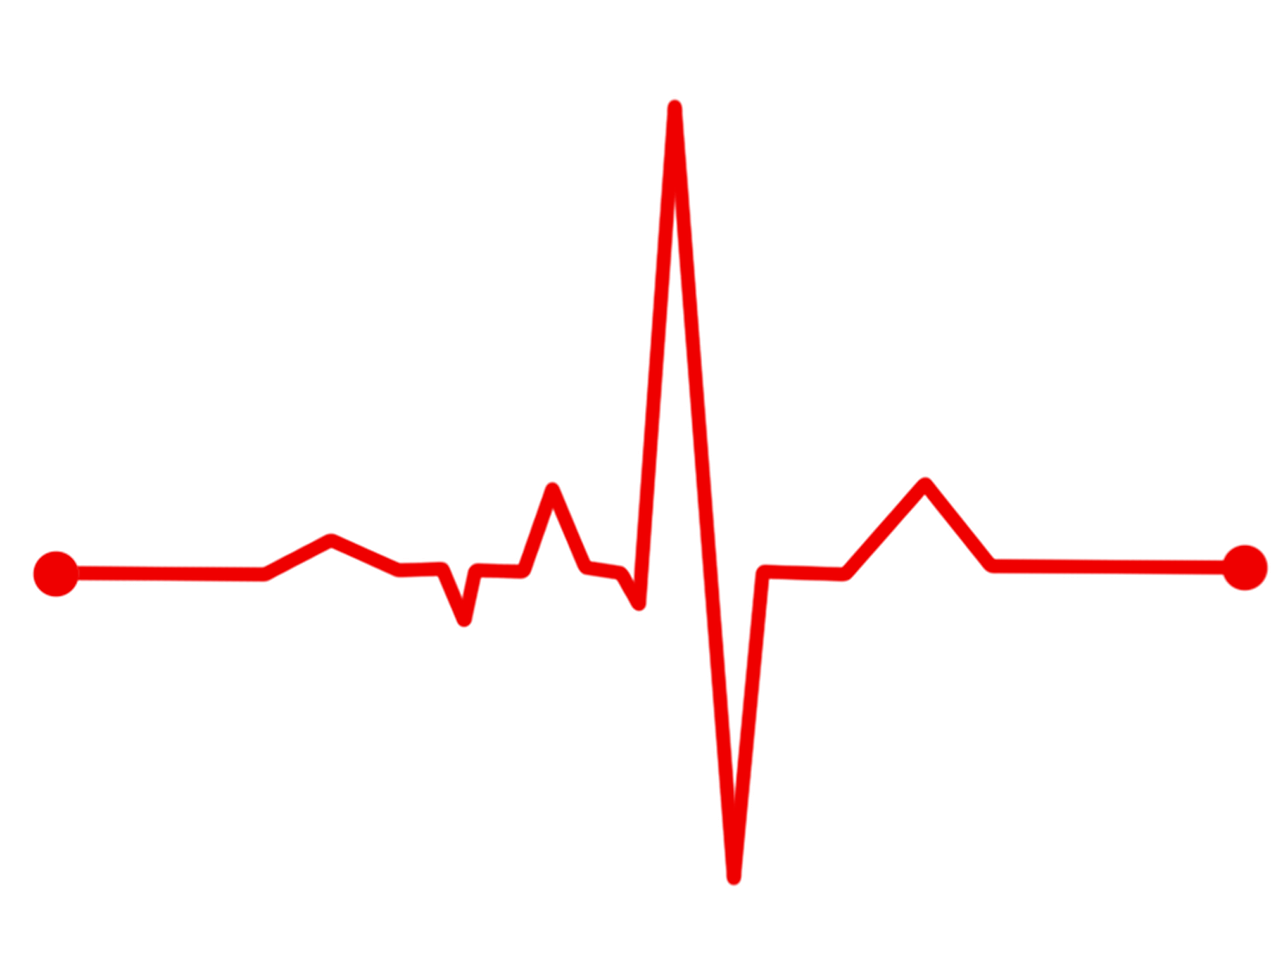 will cars monitor your health  djs associates ekg clip art flat line ekg clipart love